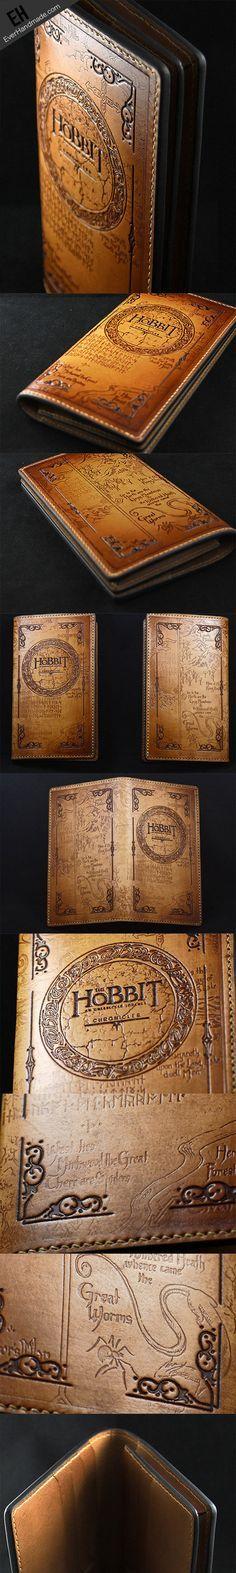 #Hobbits #hobbit Handmade carved hobbits hobbit Men leather long wallet,So stunning!!!!!!!!!!!!!!!!!!!!!!!!!!